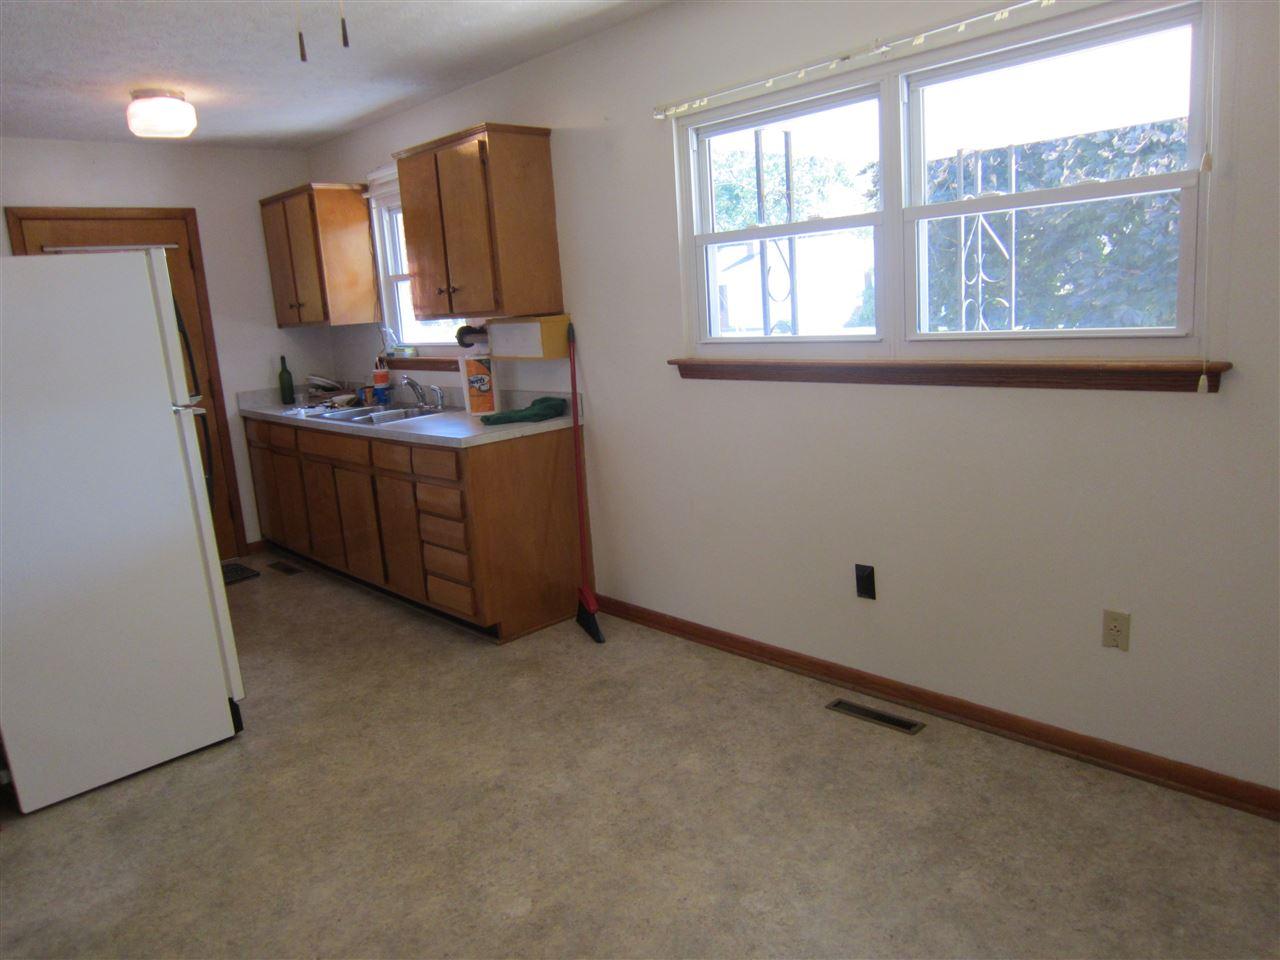 1308 Blandford St, Staunton, VA, 24401